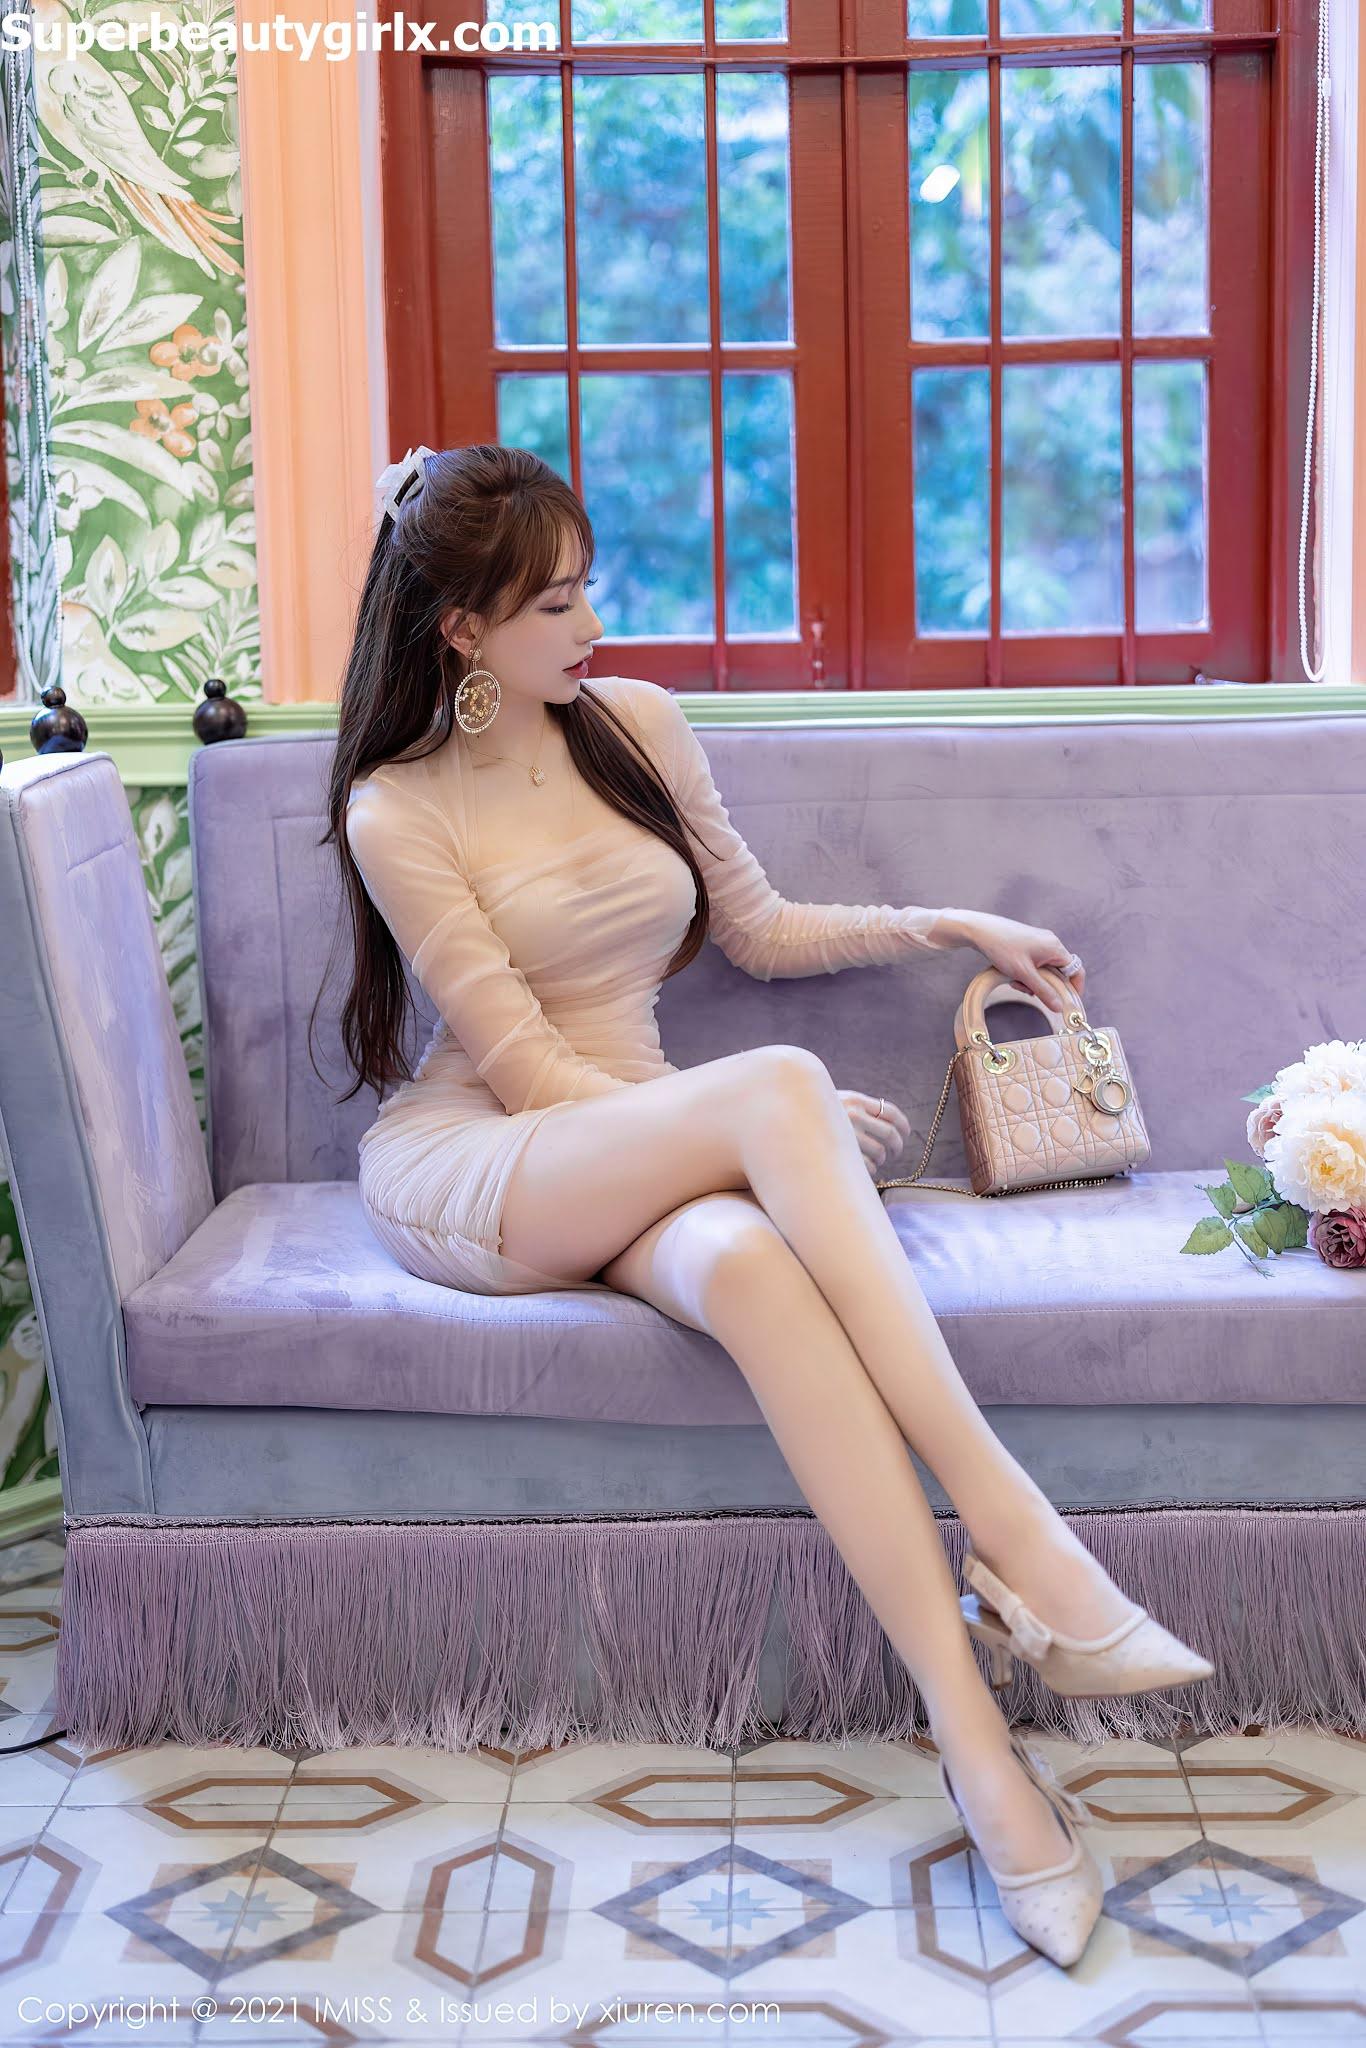 IMISS-Vol.586-Lynn-Liu-Yining-Superbeautygirlx.com